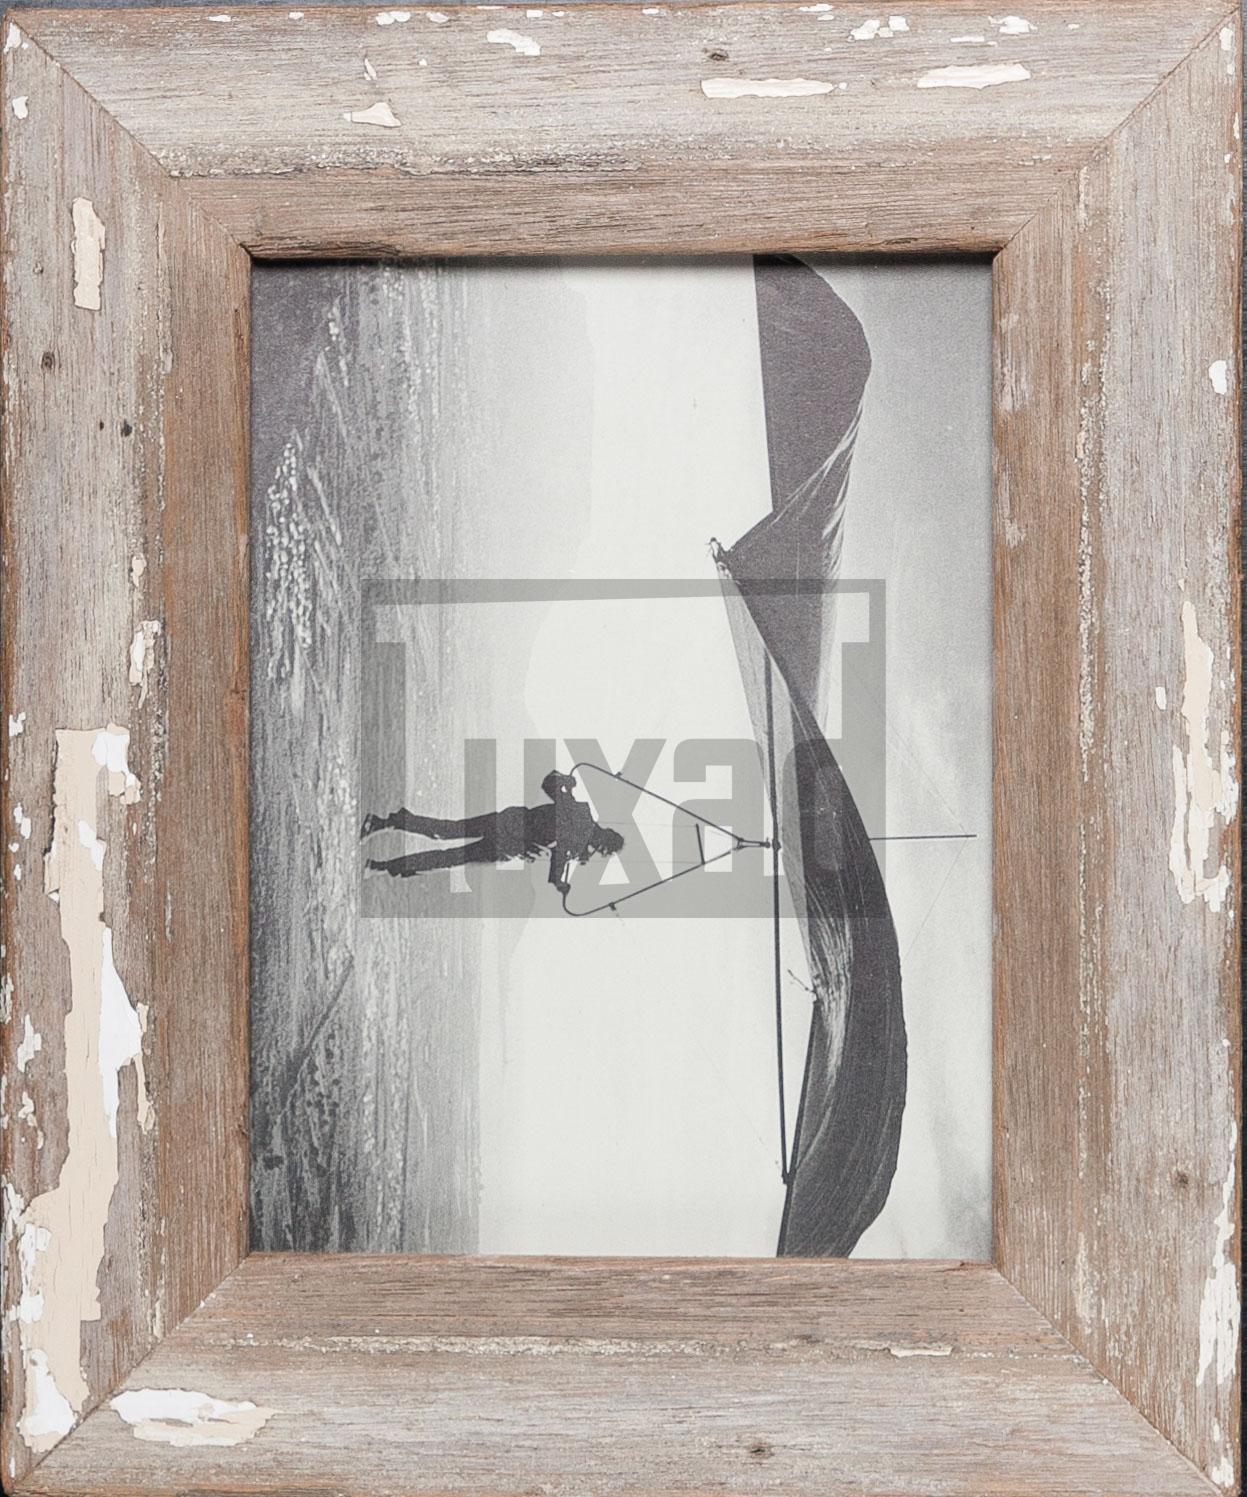 Altholz-Bilderrahmen für Fotos 15 x 20 cm